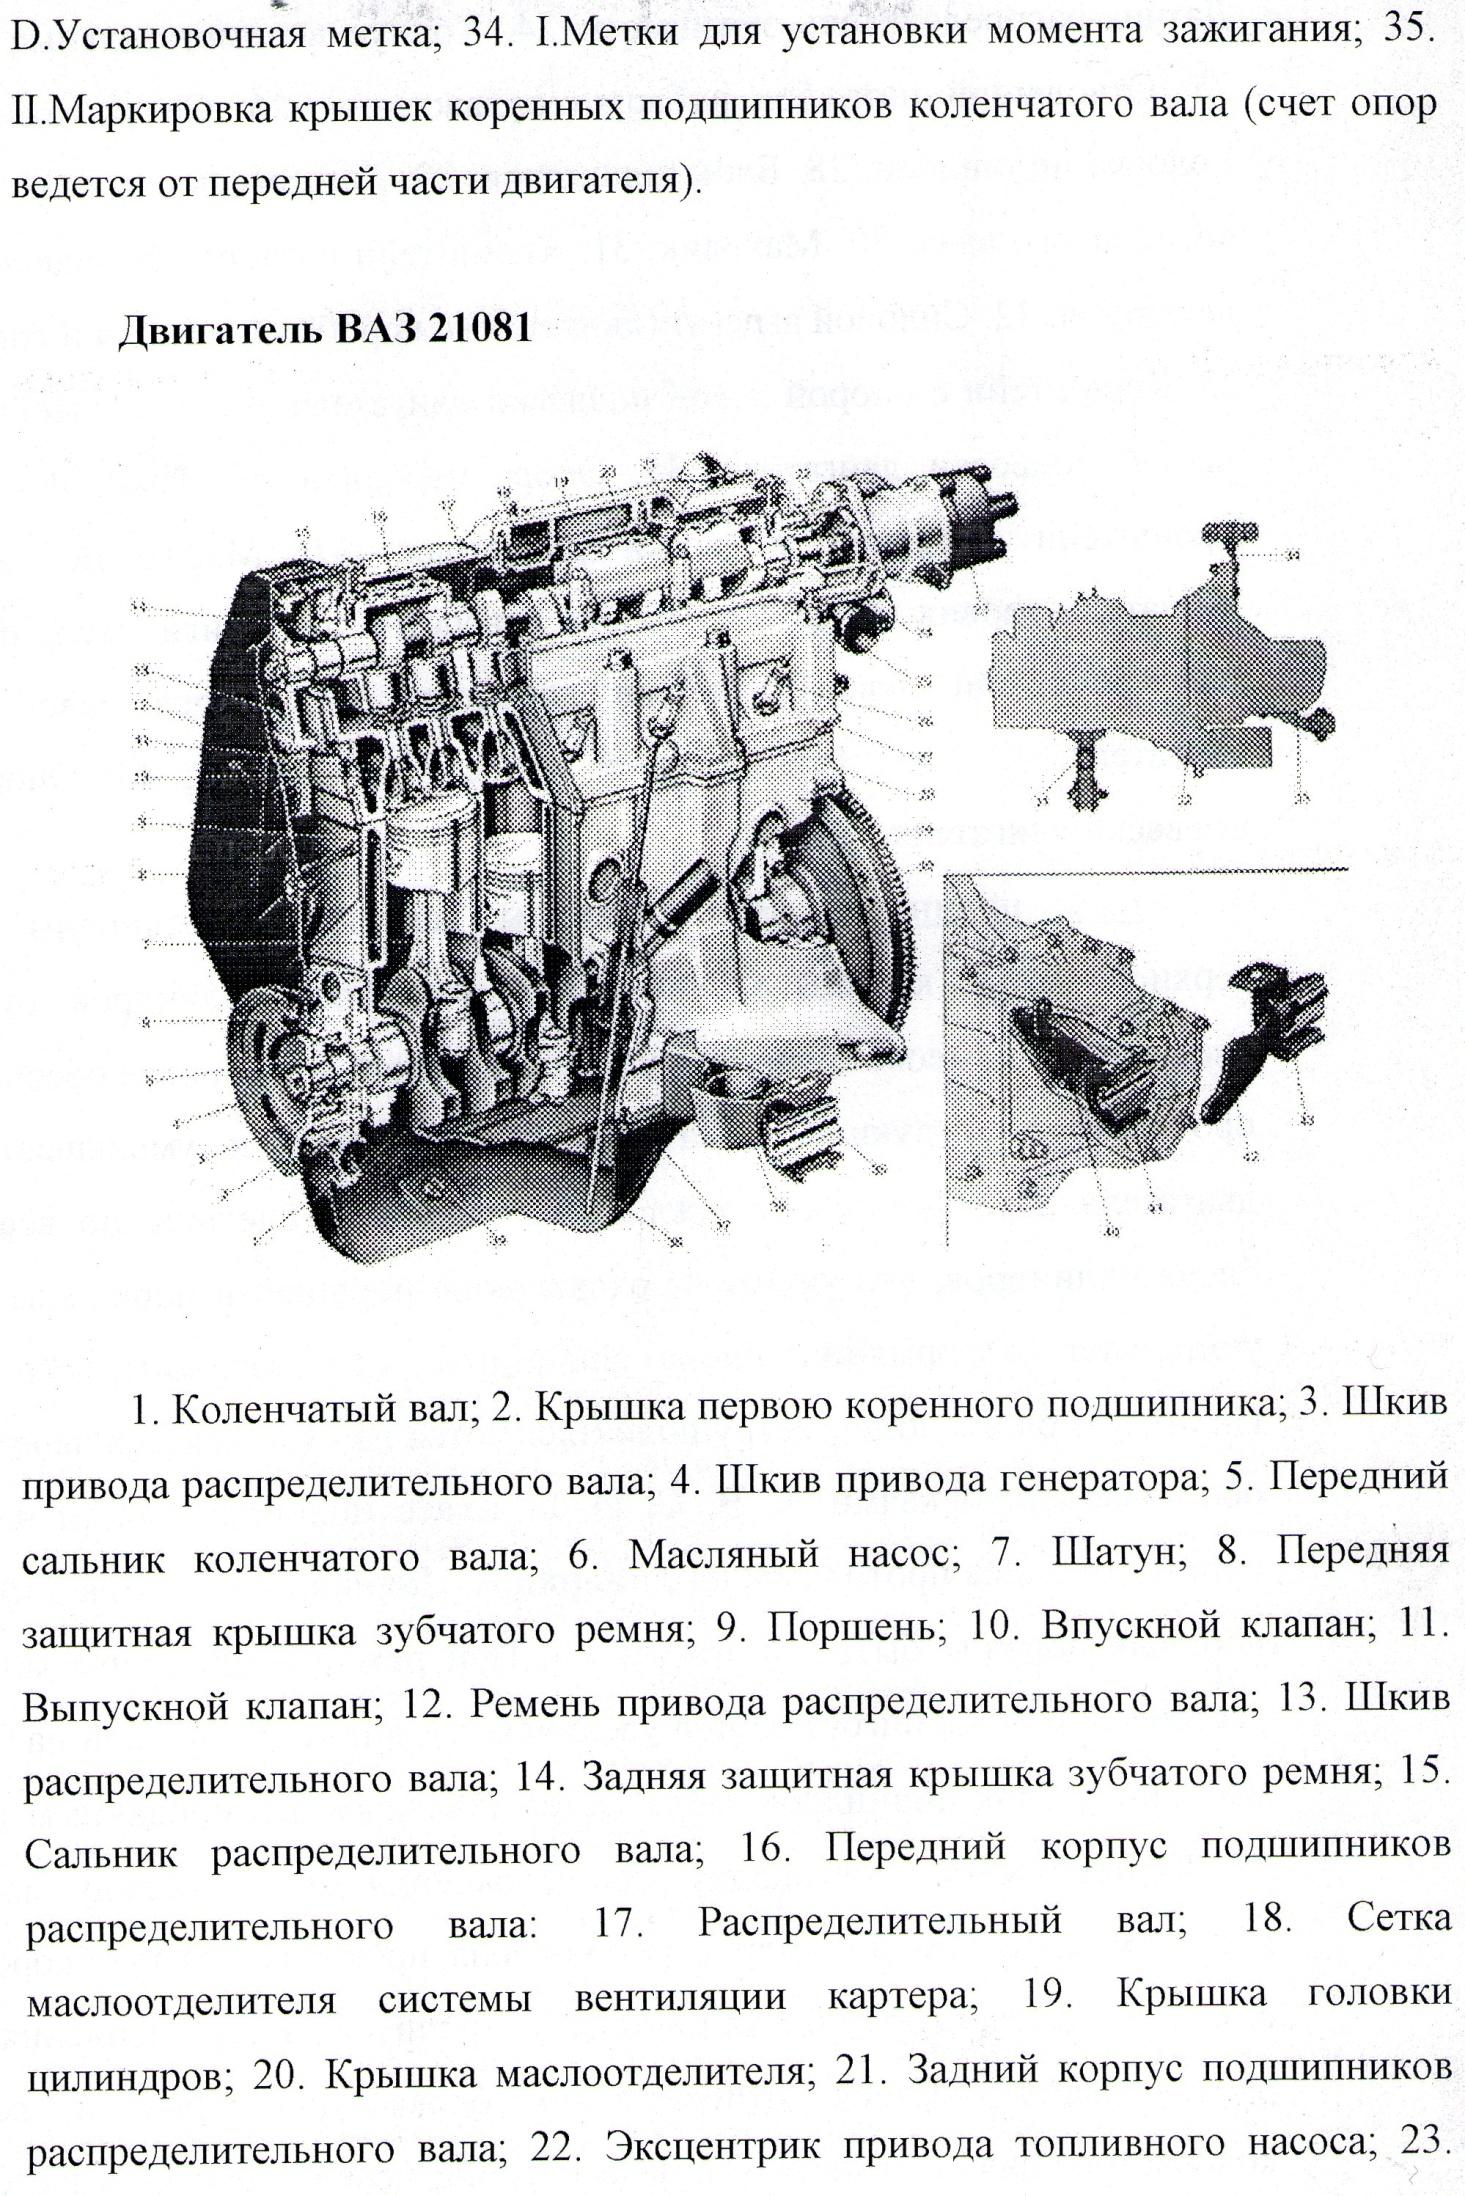 C:\Users\Василий Мельченко\Pictures\img598.jpg